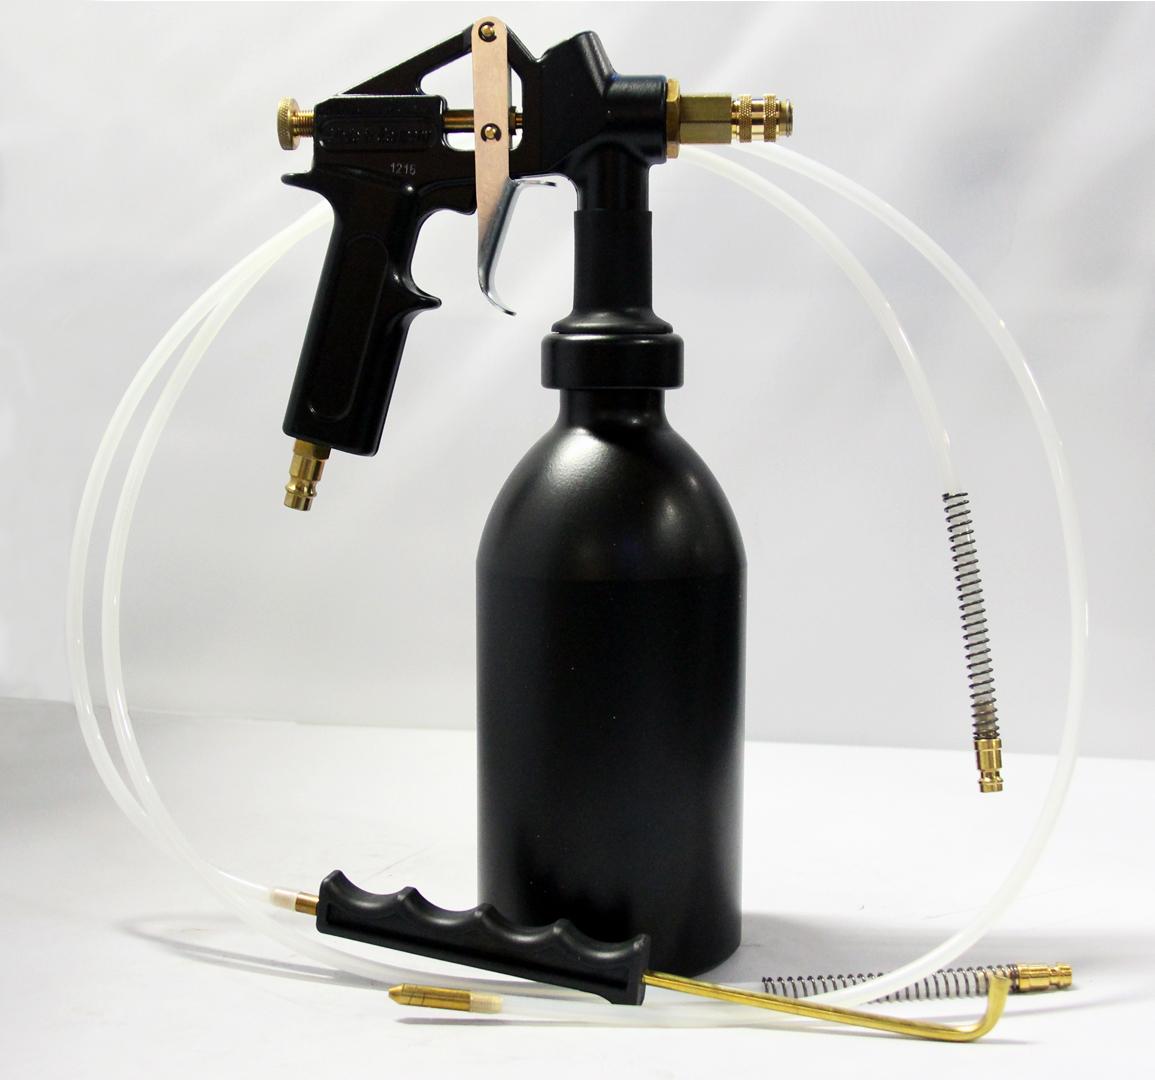 VAUPEL HSDR 3300 Persreservoirpistool